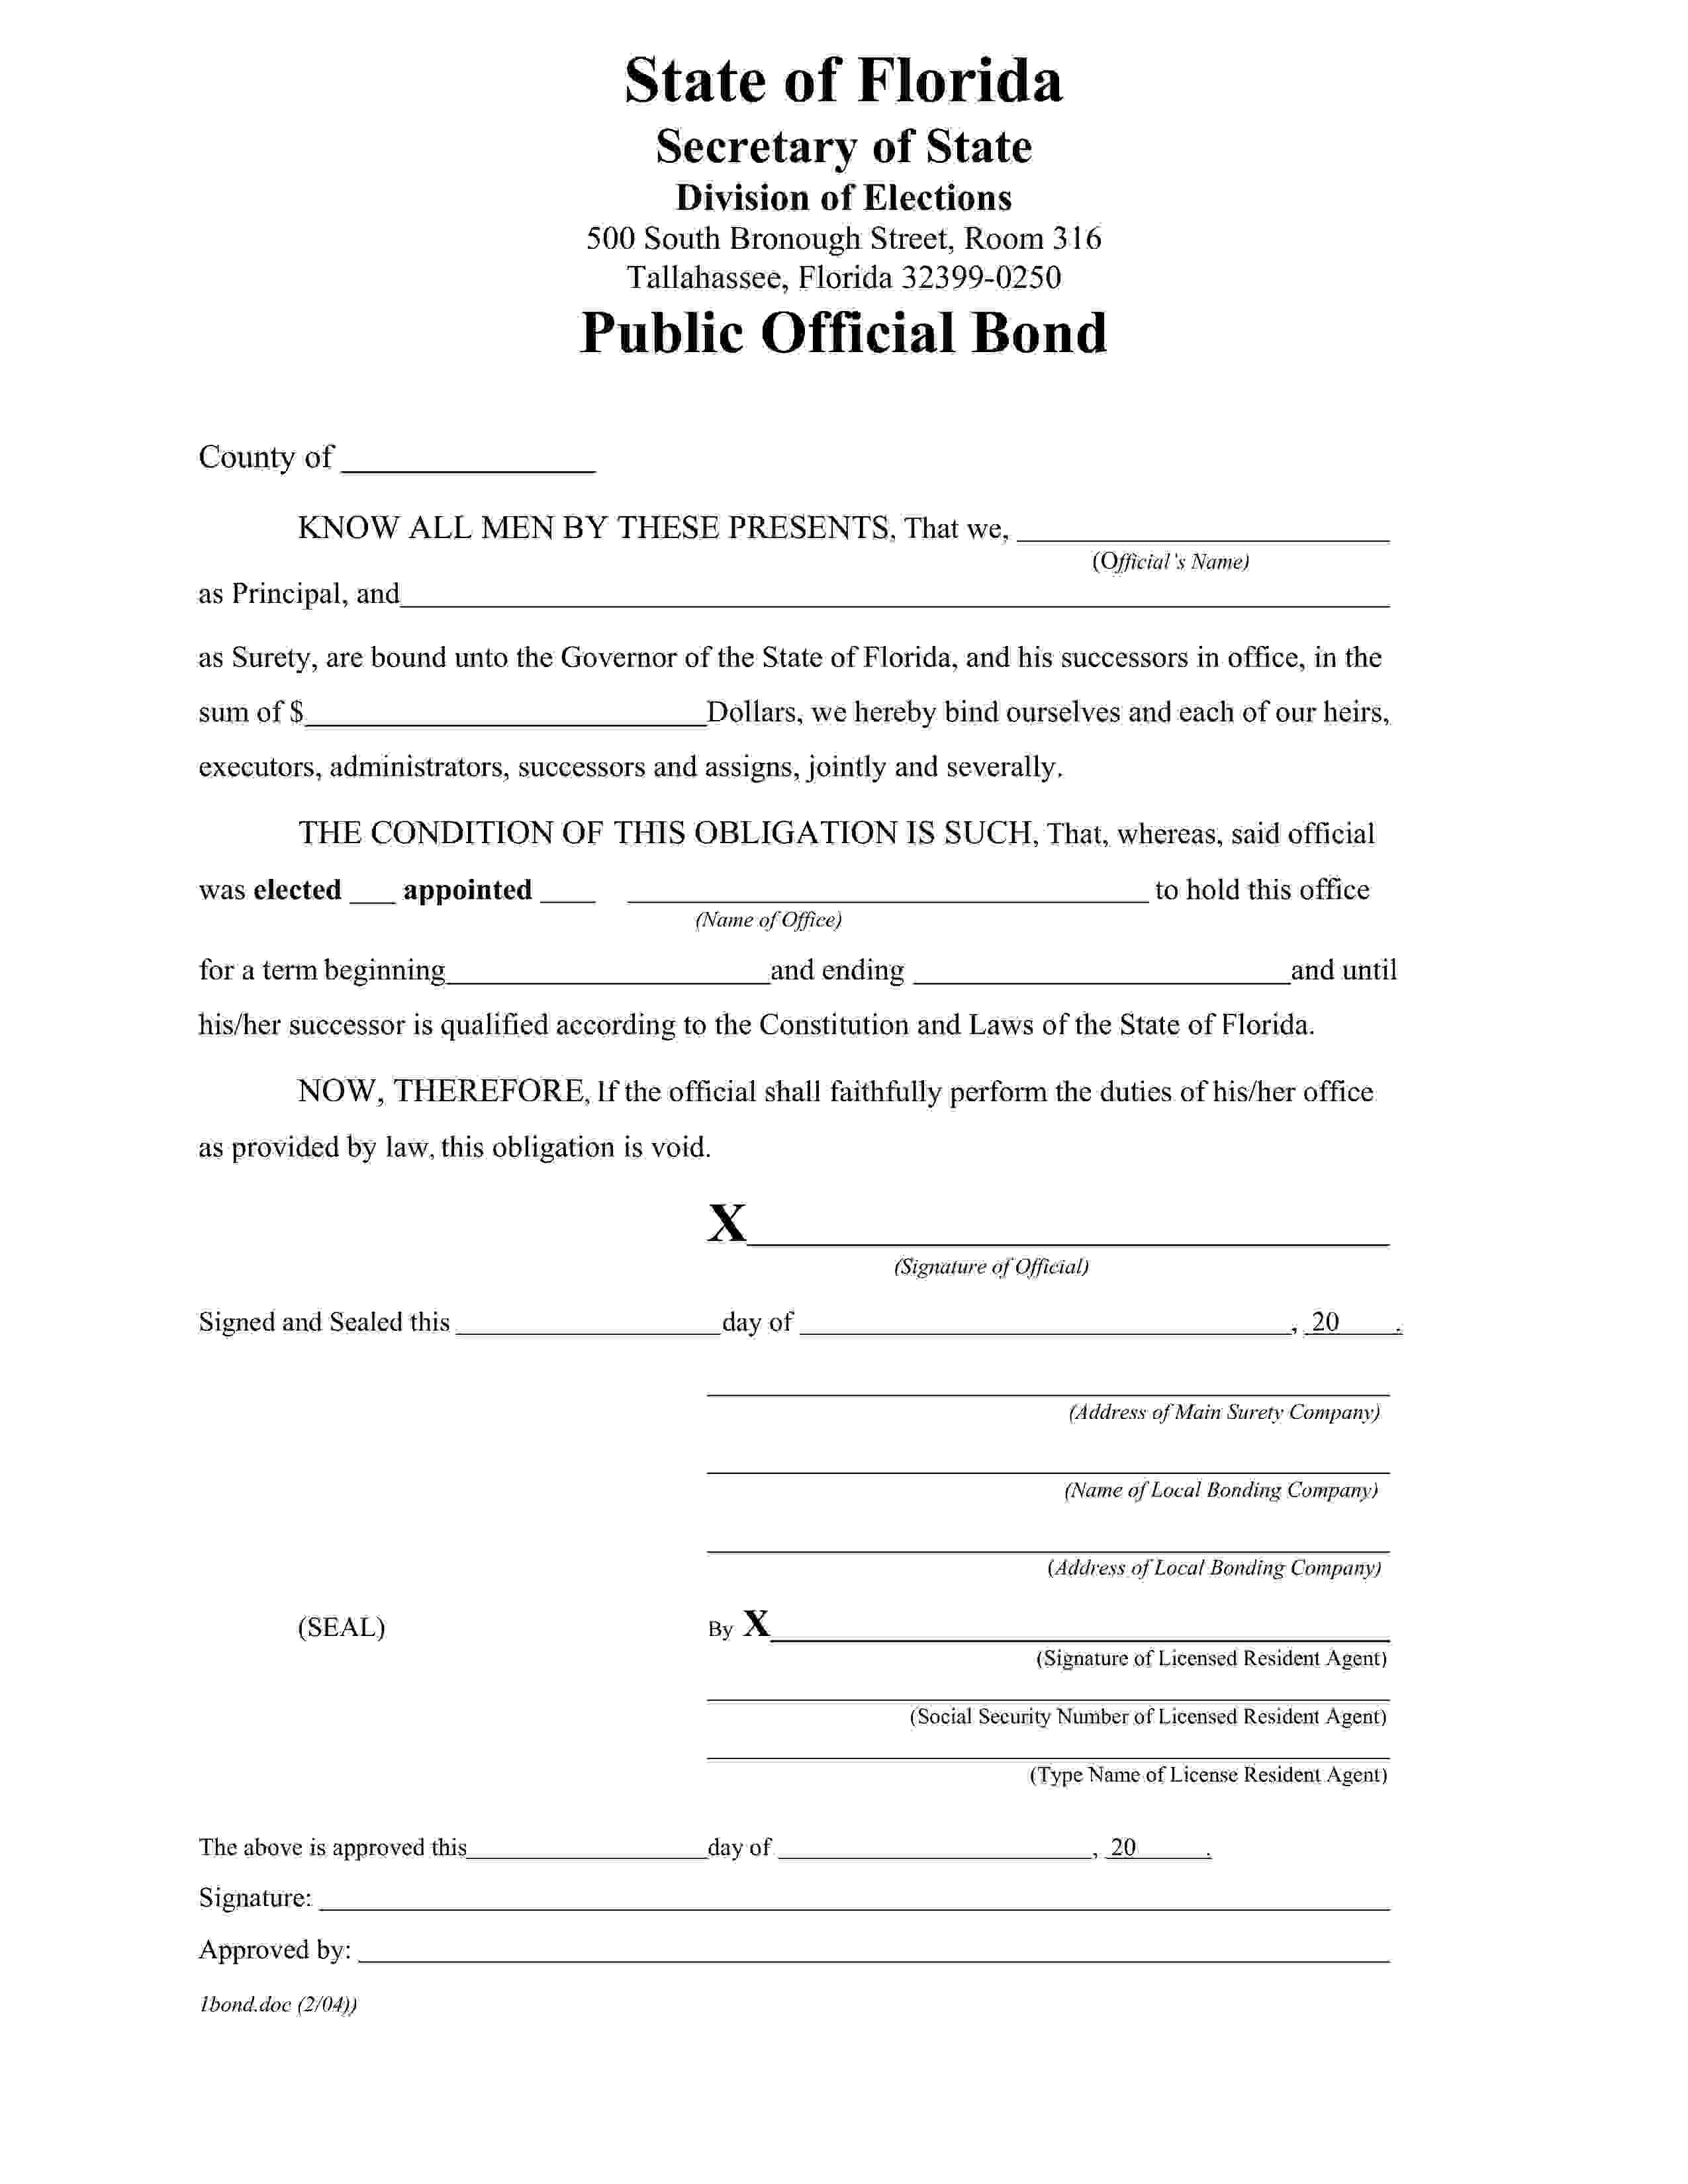 Florida Secretary Of State Treasurer or Tax Collector Bond sample image